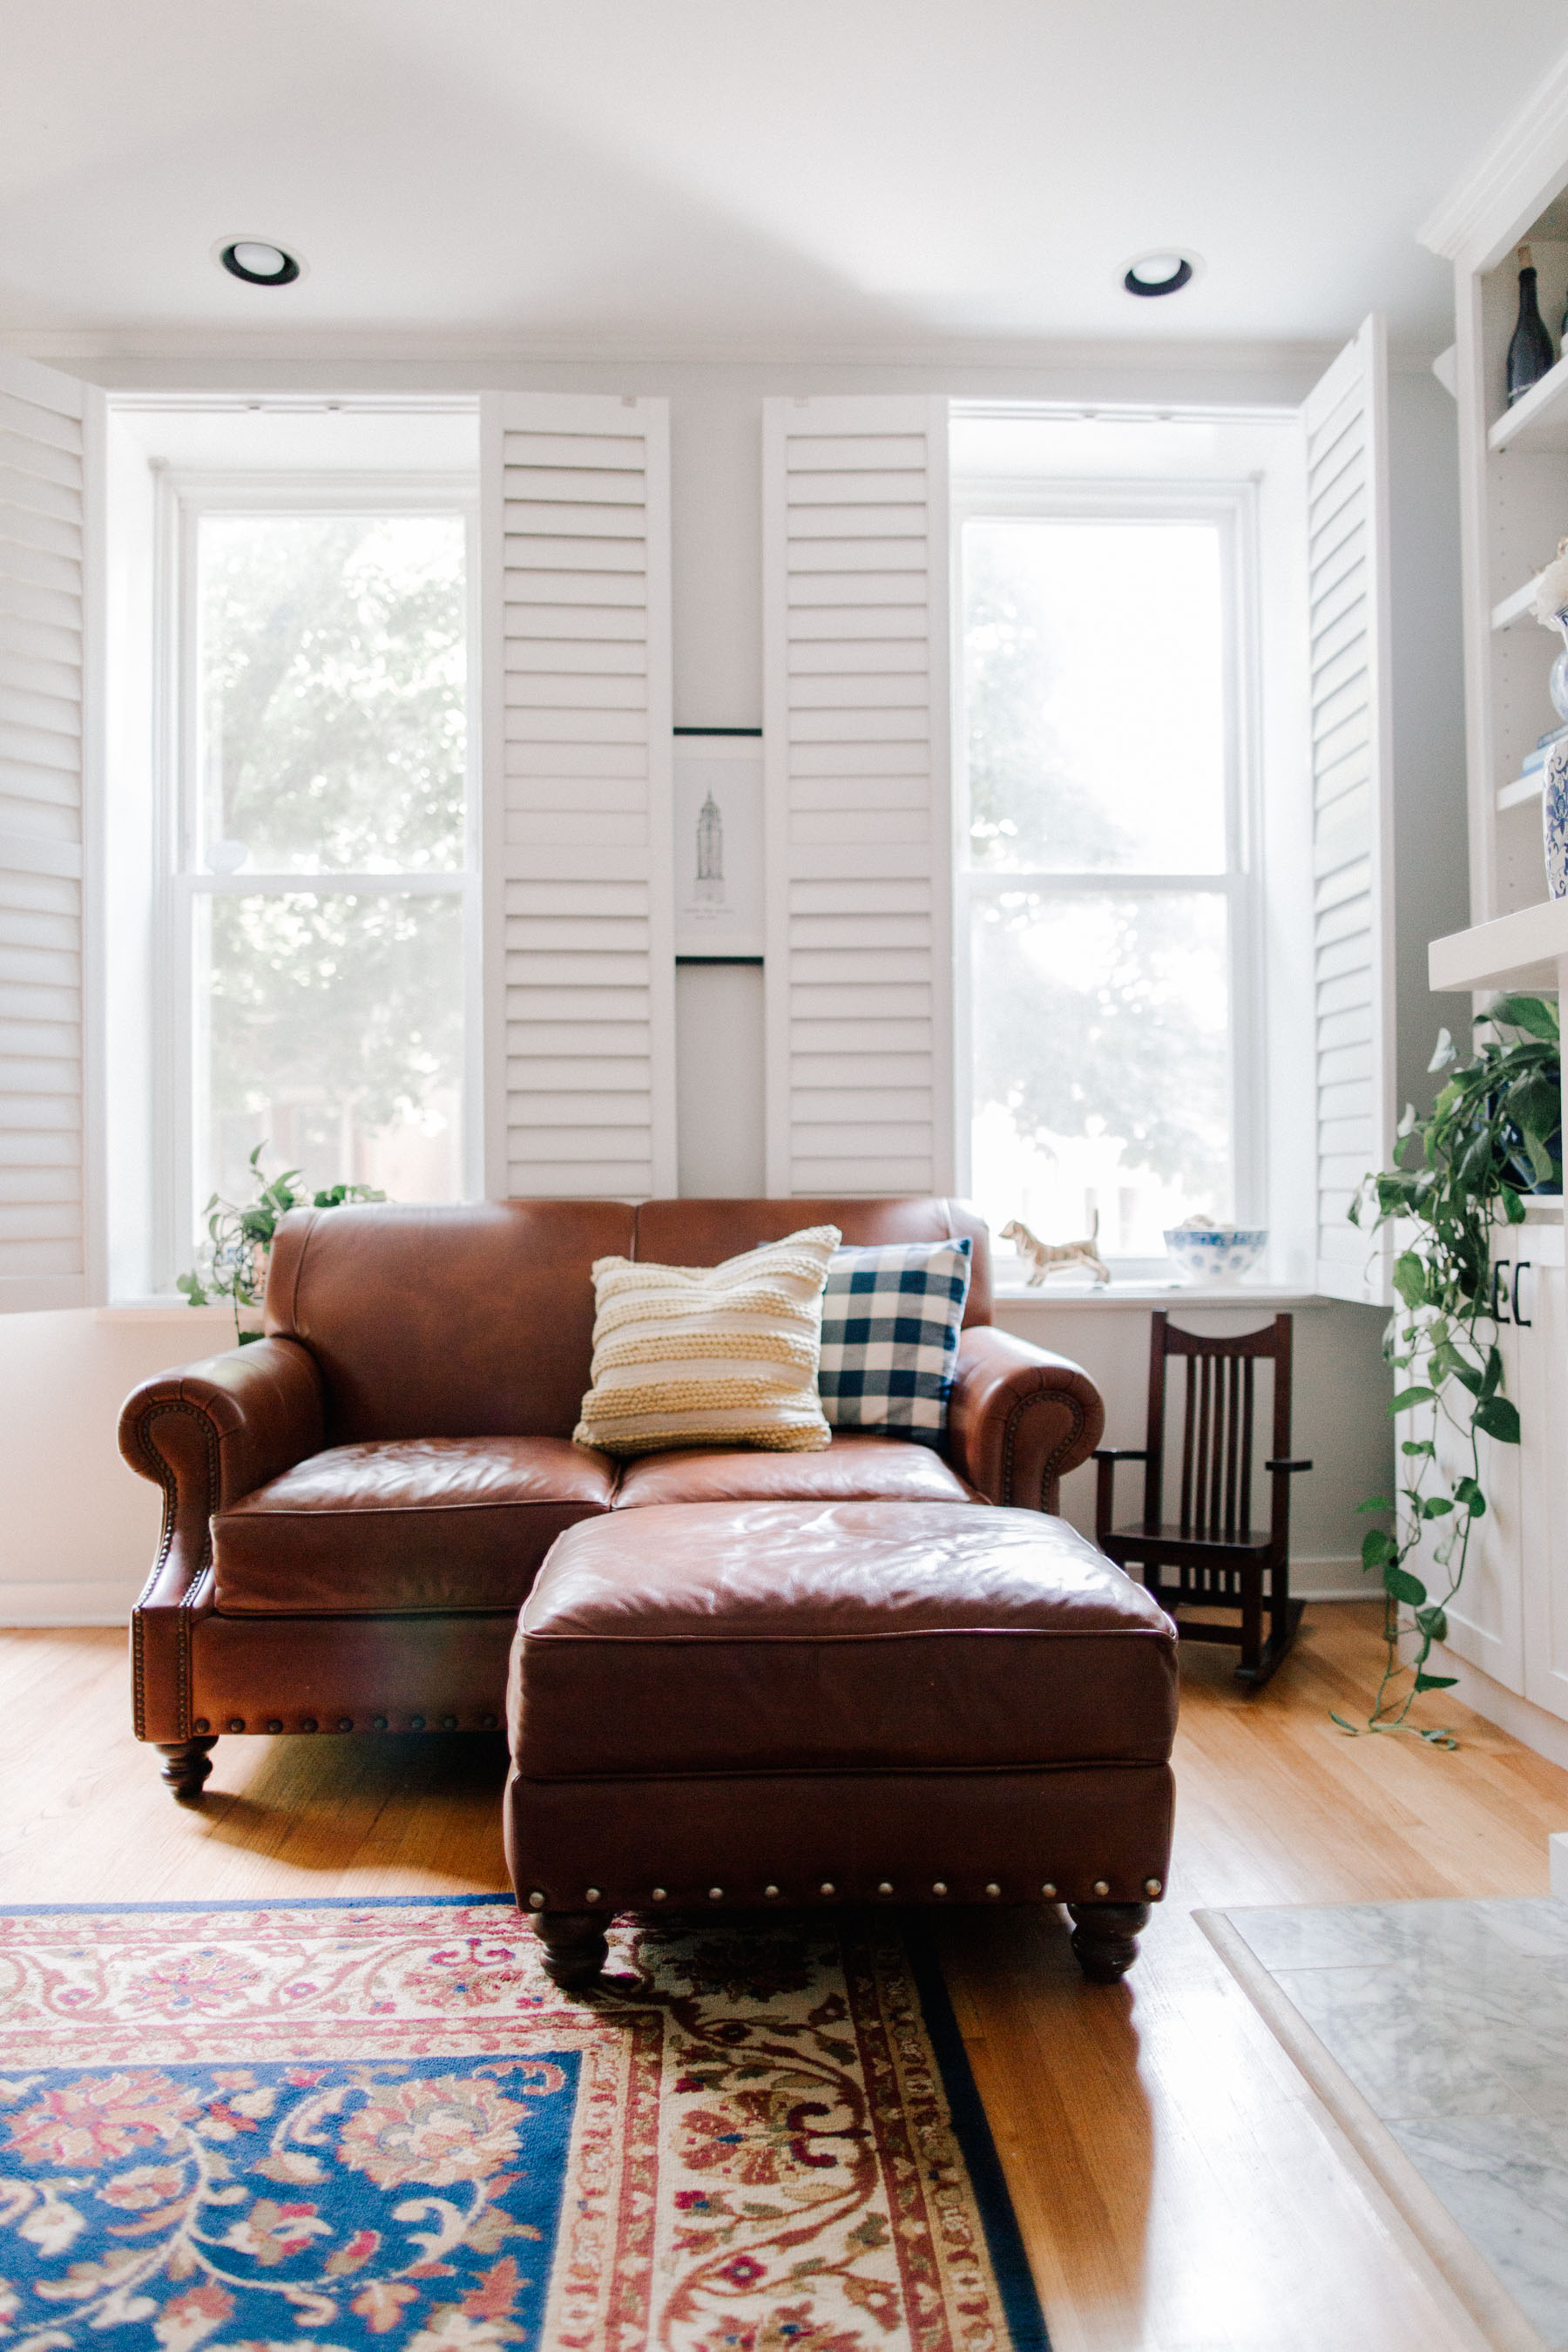 Living Room Renovation by Kelly Larkin | Kelly in the City